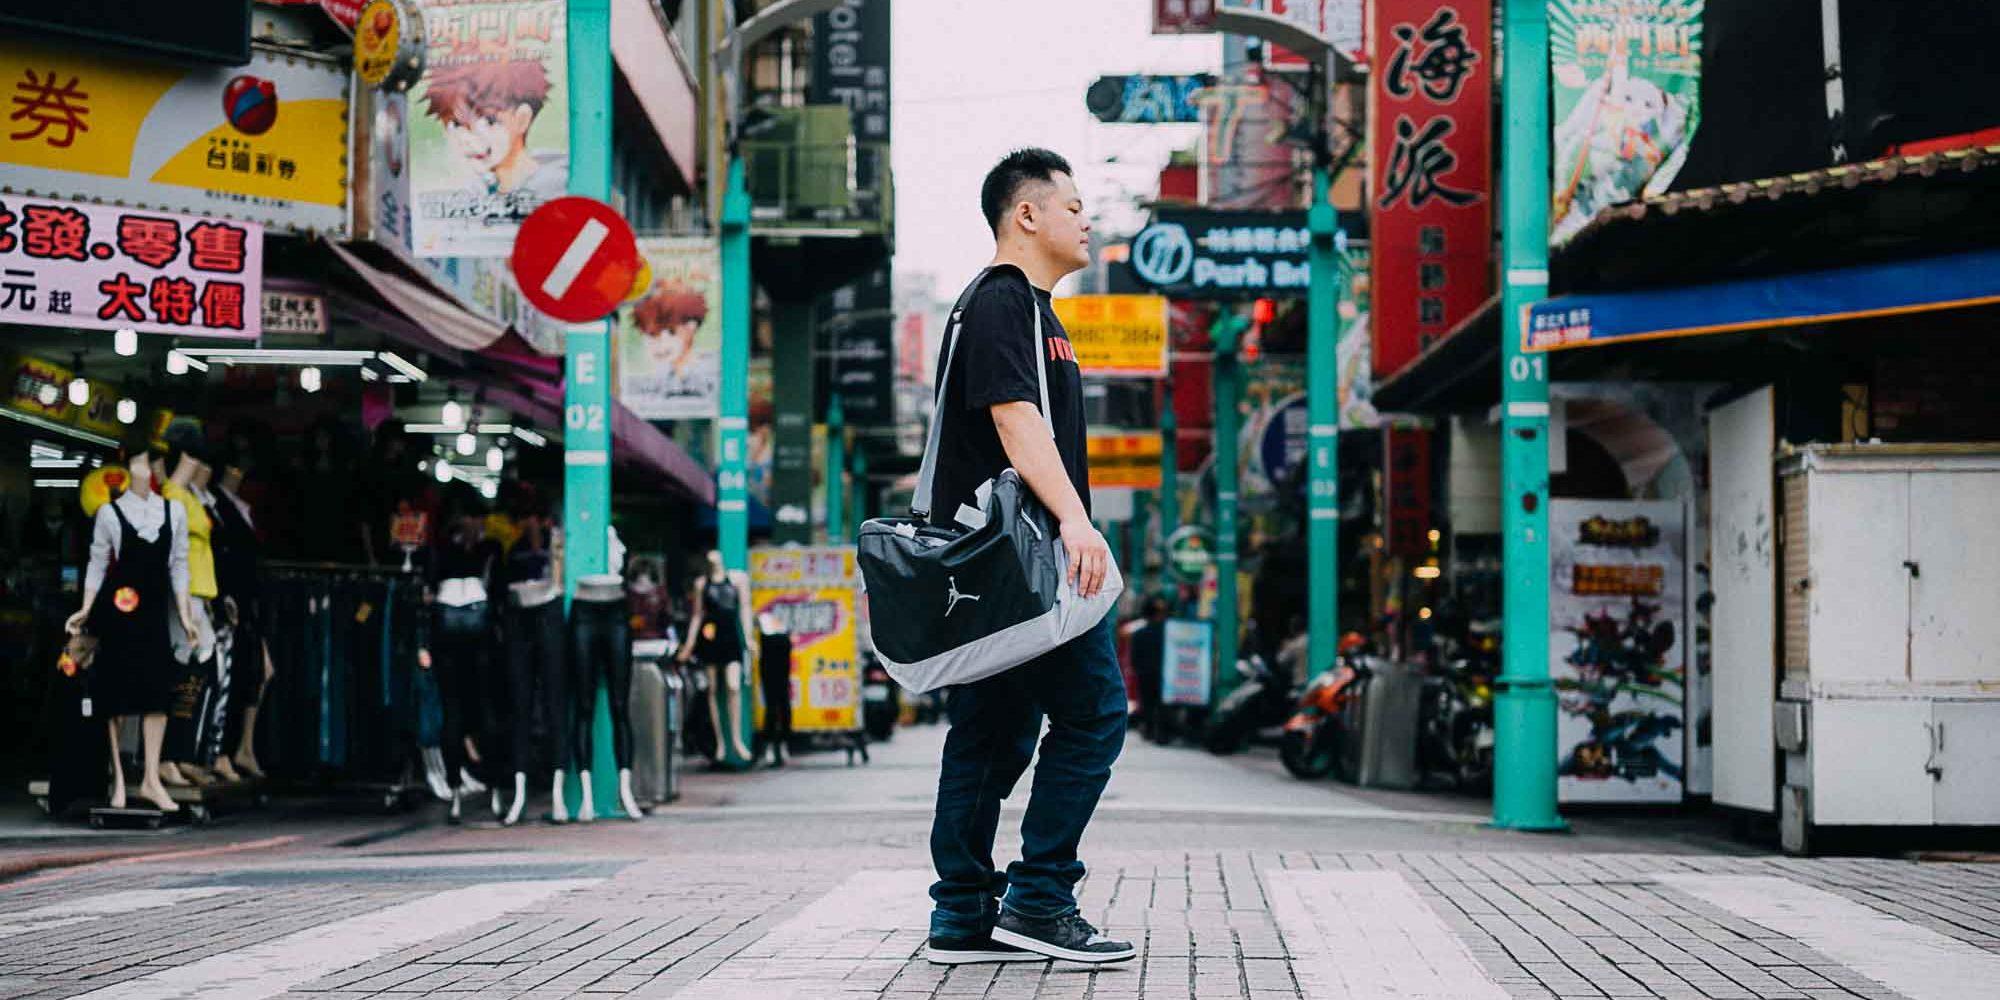 2017-air-jordan-4-carter-taiwan-sneakers-collector-interview-8